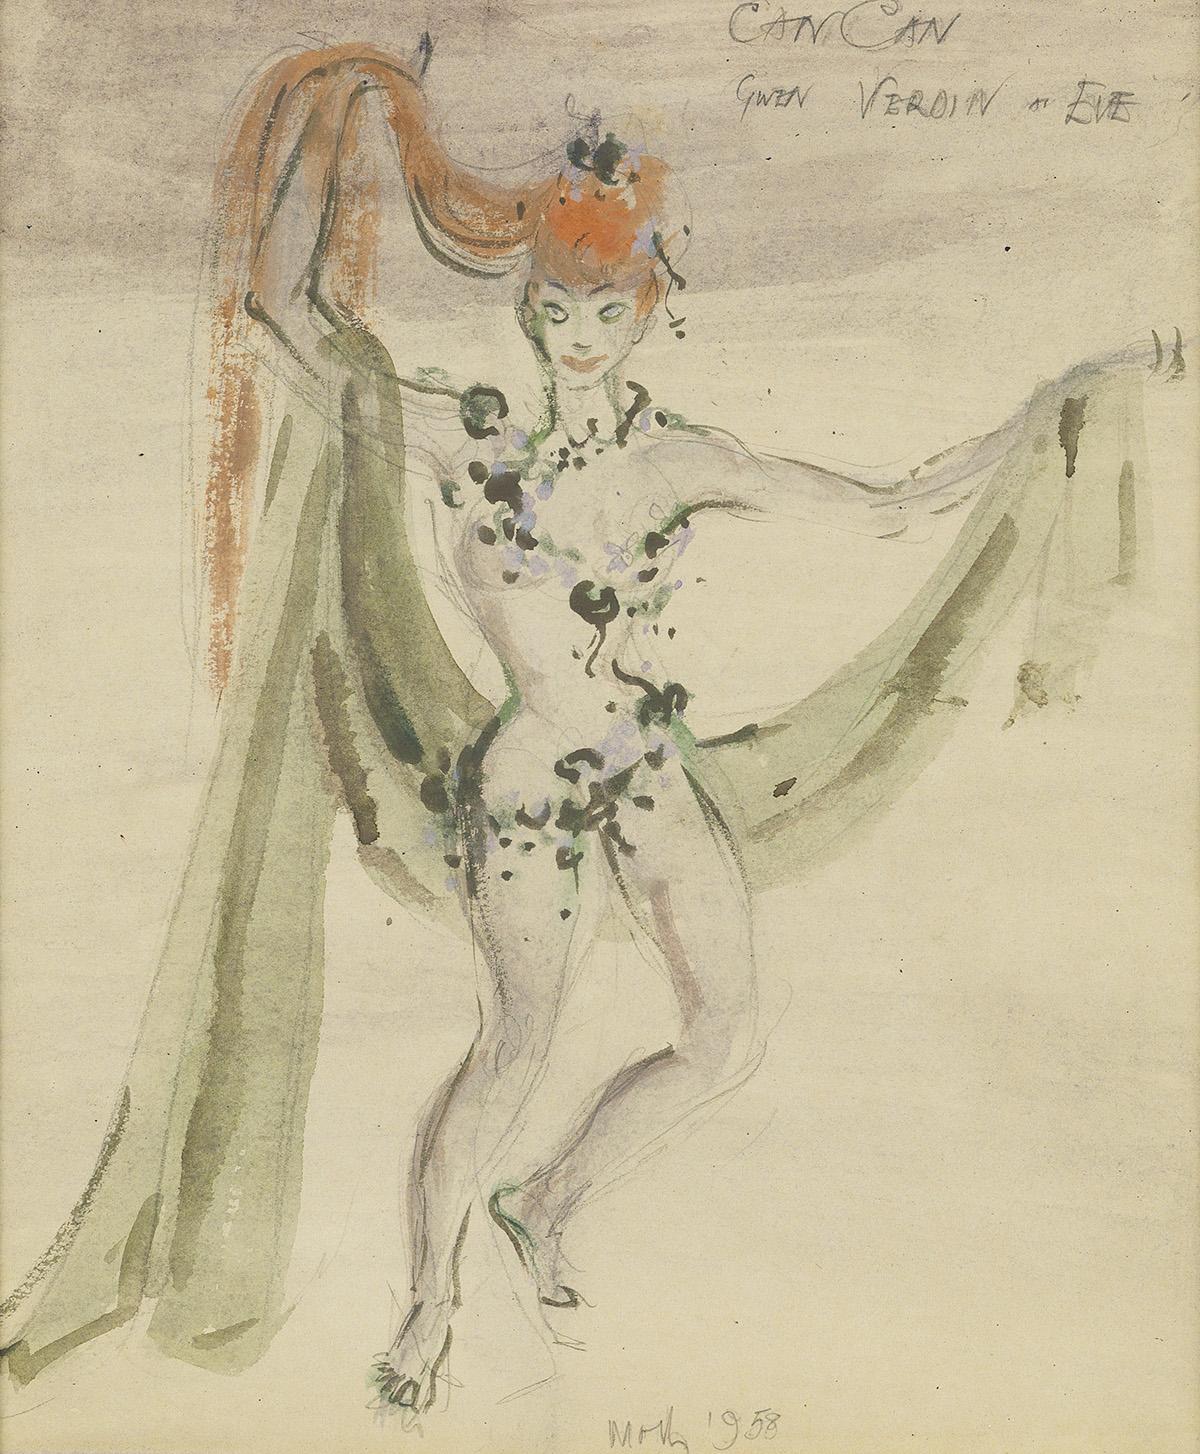 (THEATER / COSTUME) MOTLEY. [ELIZABETH MONTGOMERY.] Gwen Verdon as Eve.